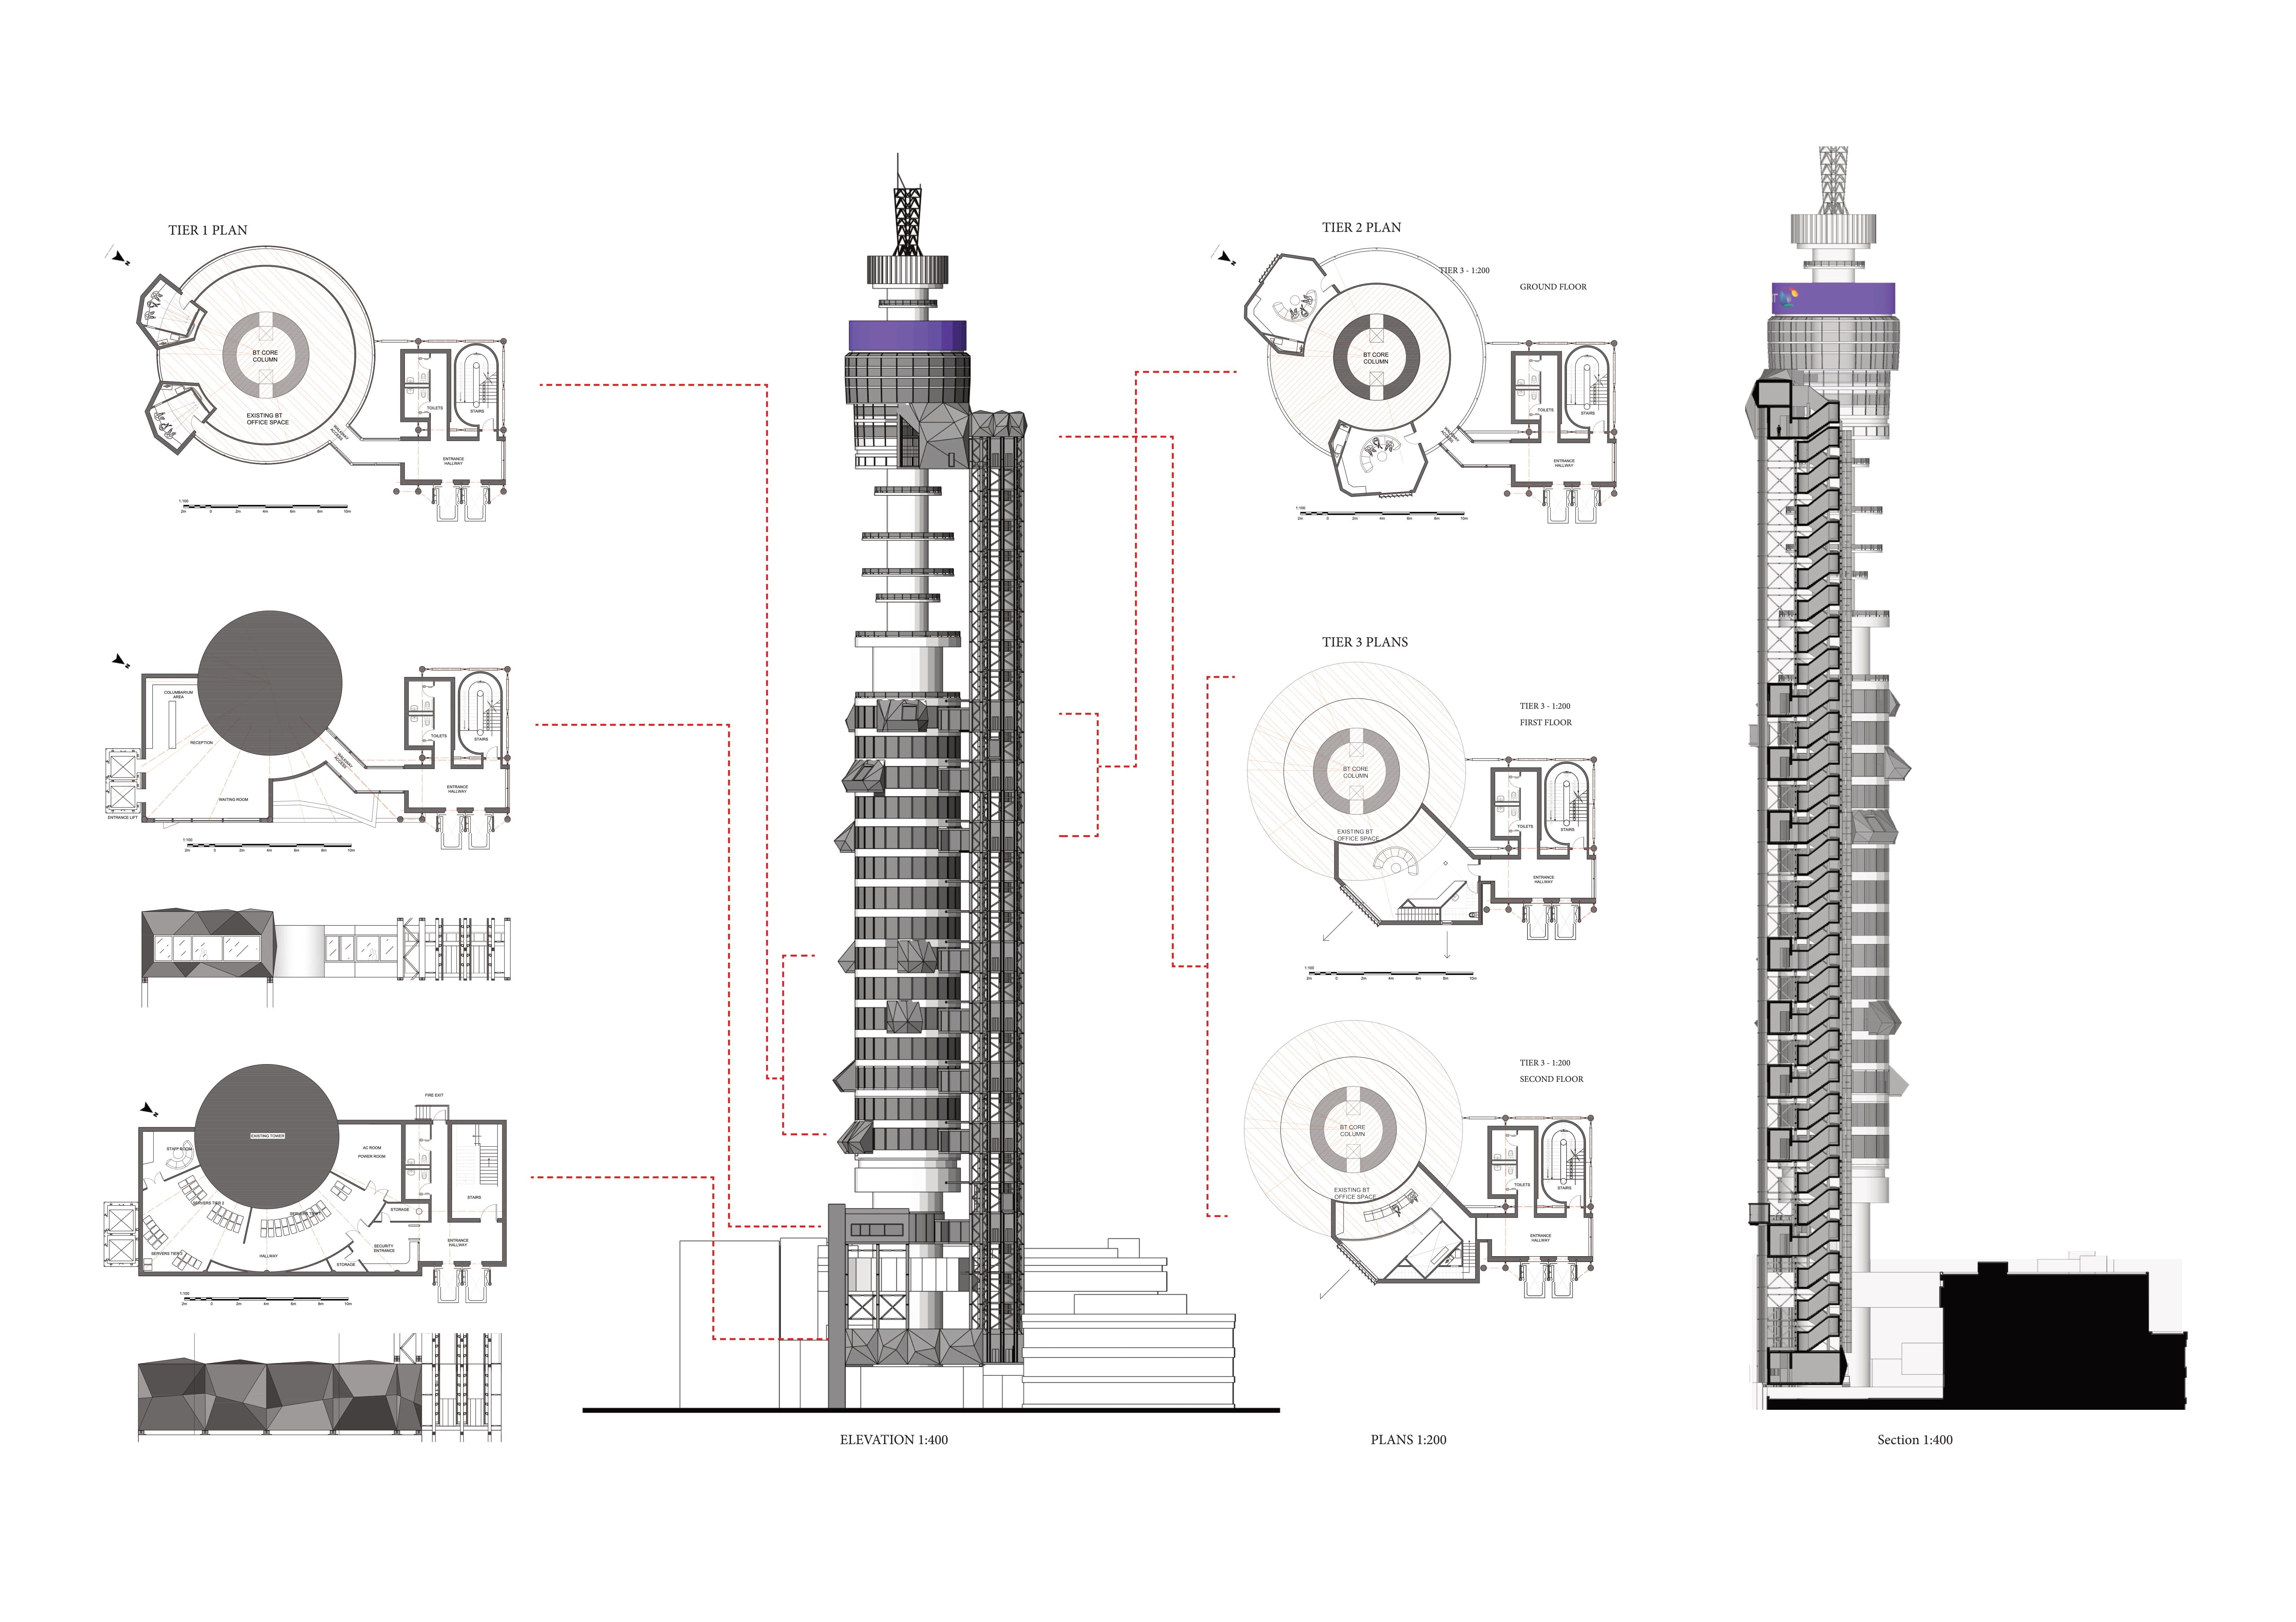 Design Plans.